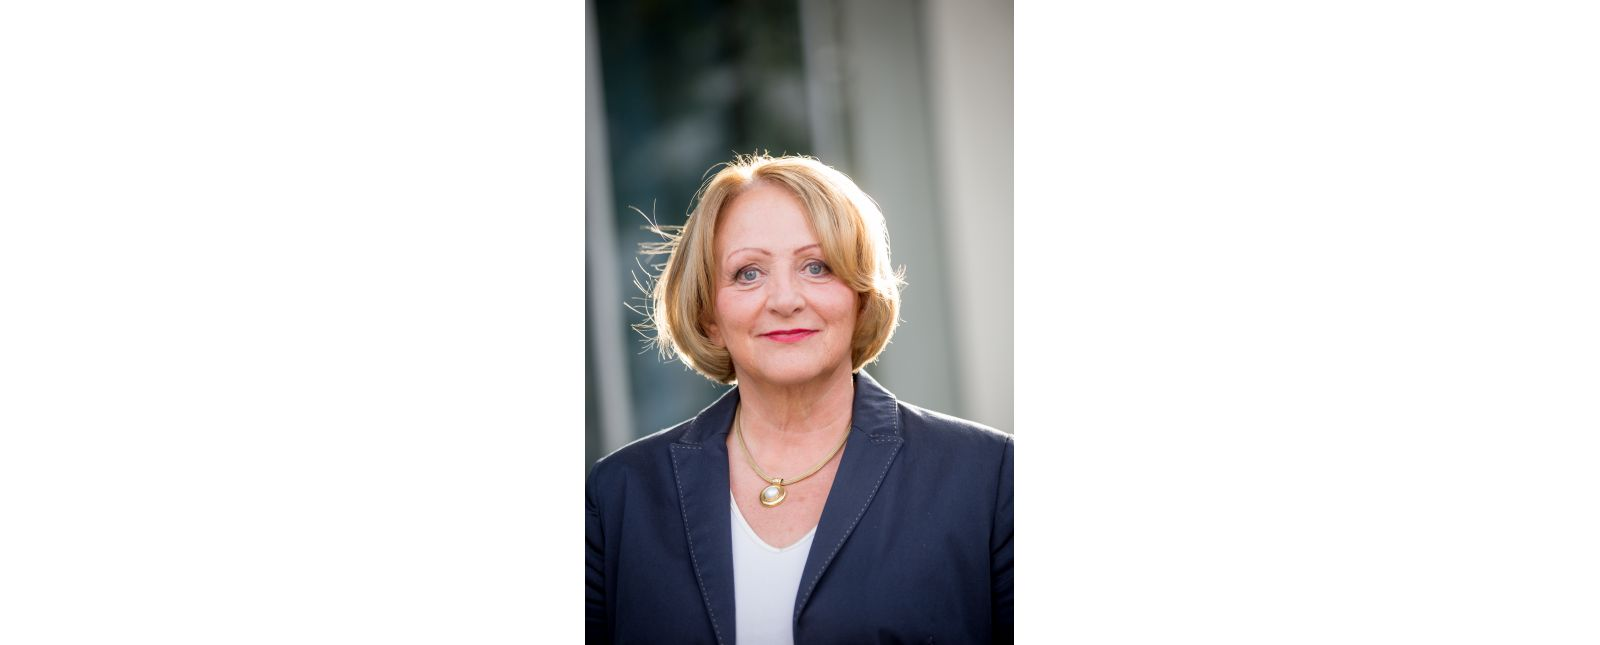 Sabine Leutheusser-Schnarrenberger //  Susanne Krauss